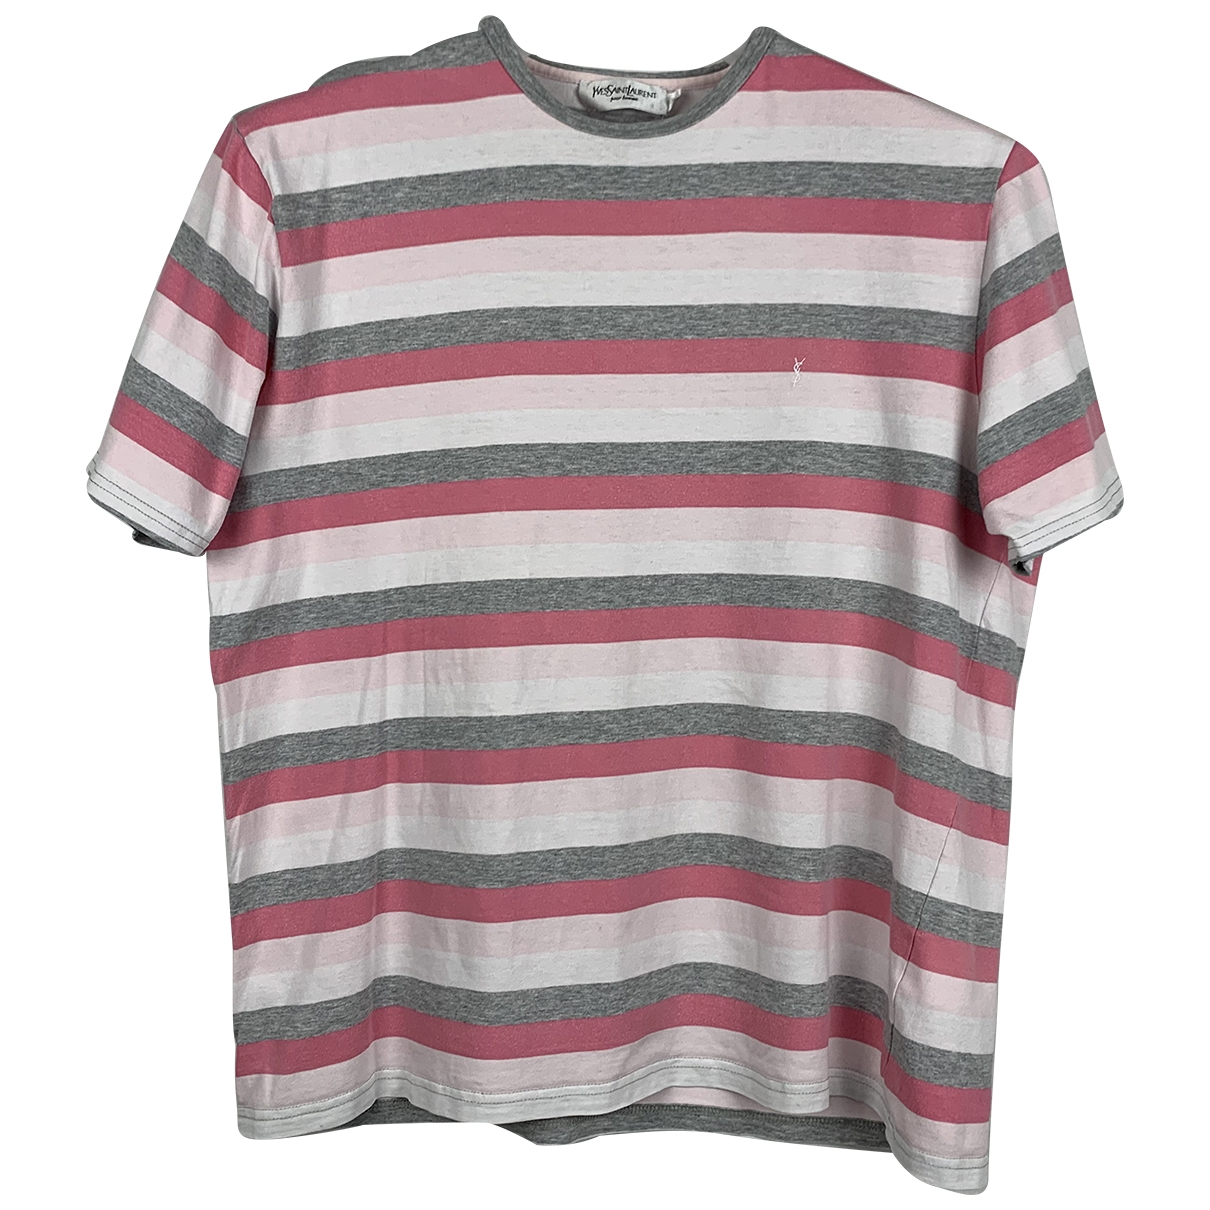 Yves Saint Laurent \N Pink Cotton T-shirts for Men S International